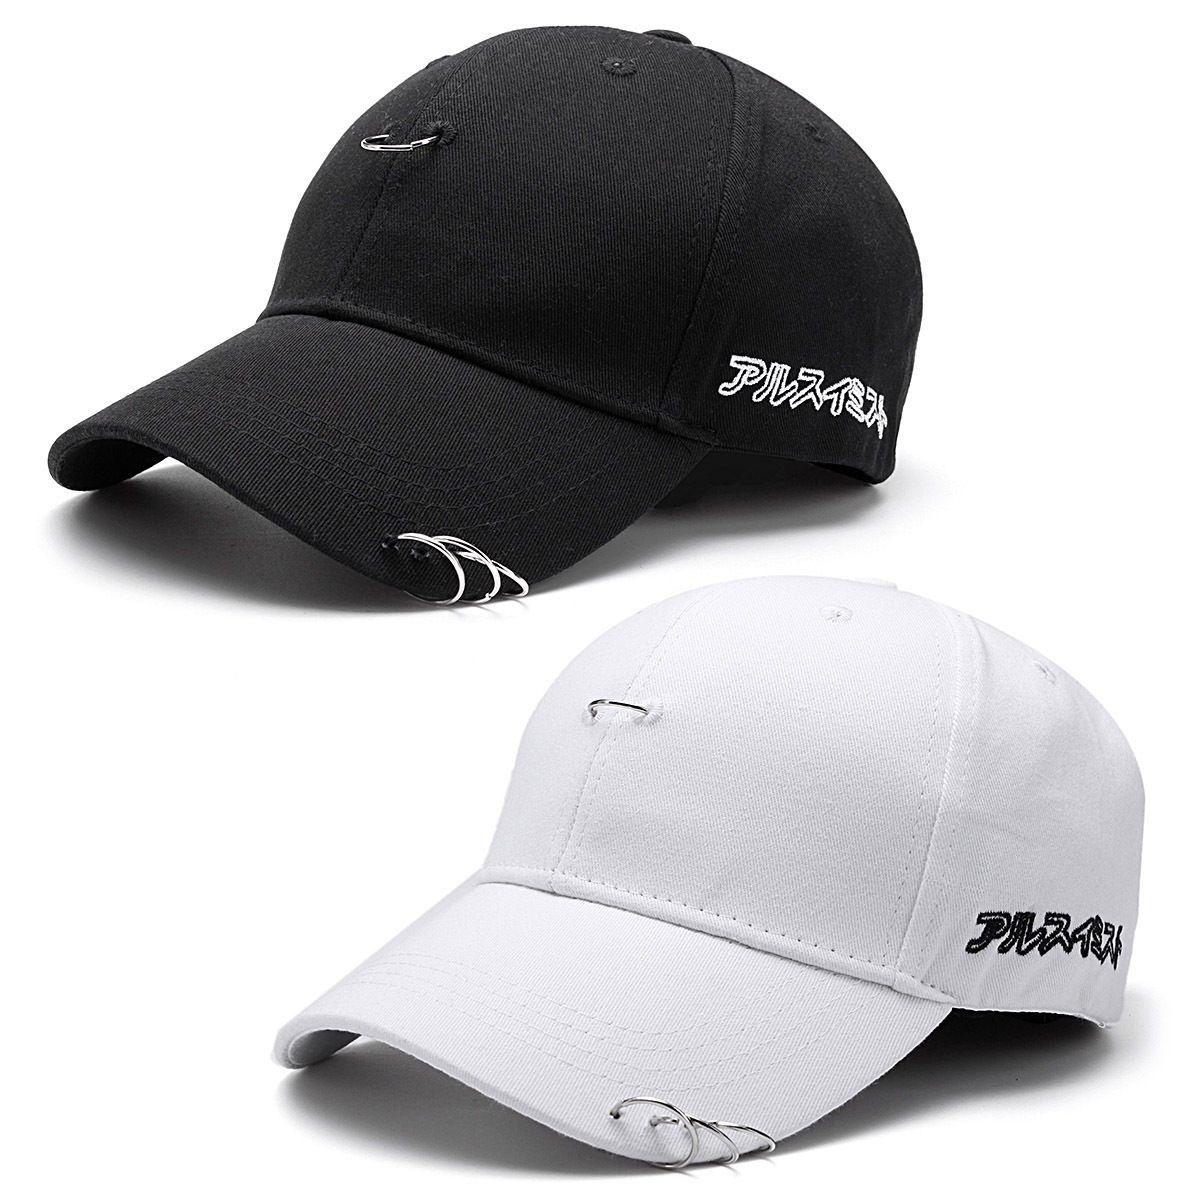 93210e0a48d63 Baseball Cap Unisex Solid Ring Safety Pin Curved Hats Baseball Cap Men  Women Snapback Caps Casquette Gorras Baseball Cap Snapback Caps Cap Men  Women Online ...